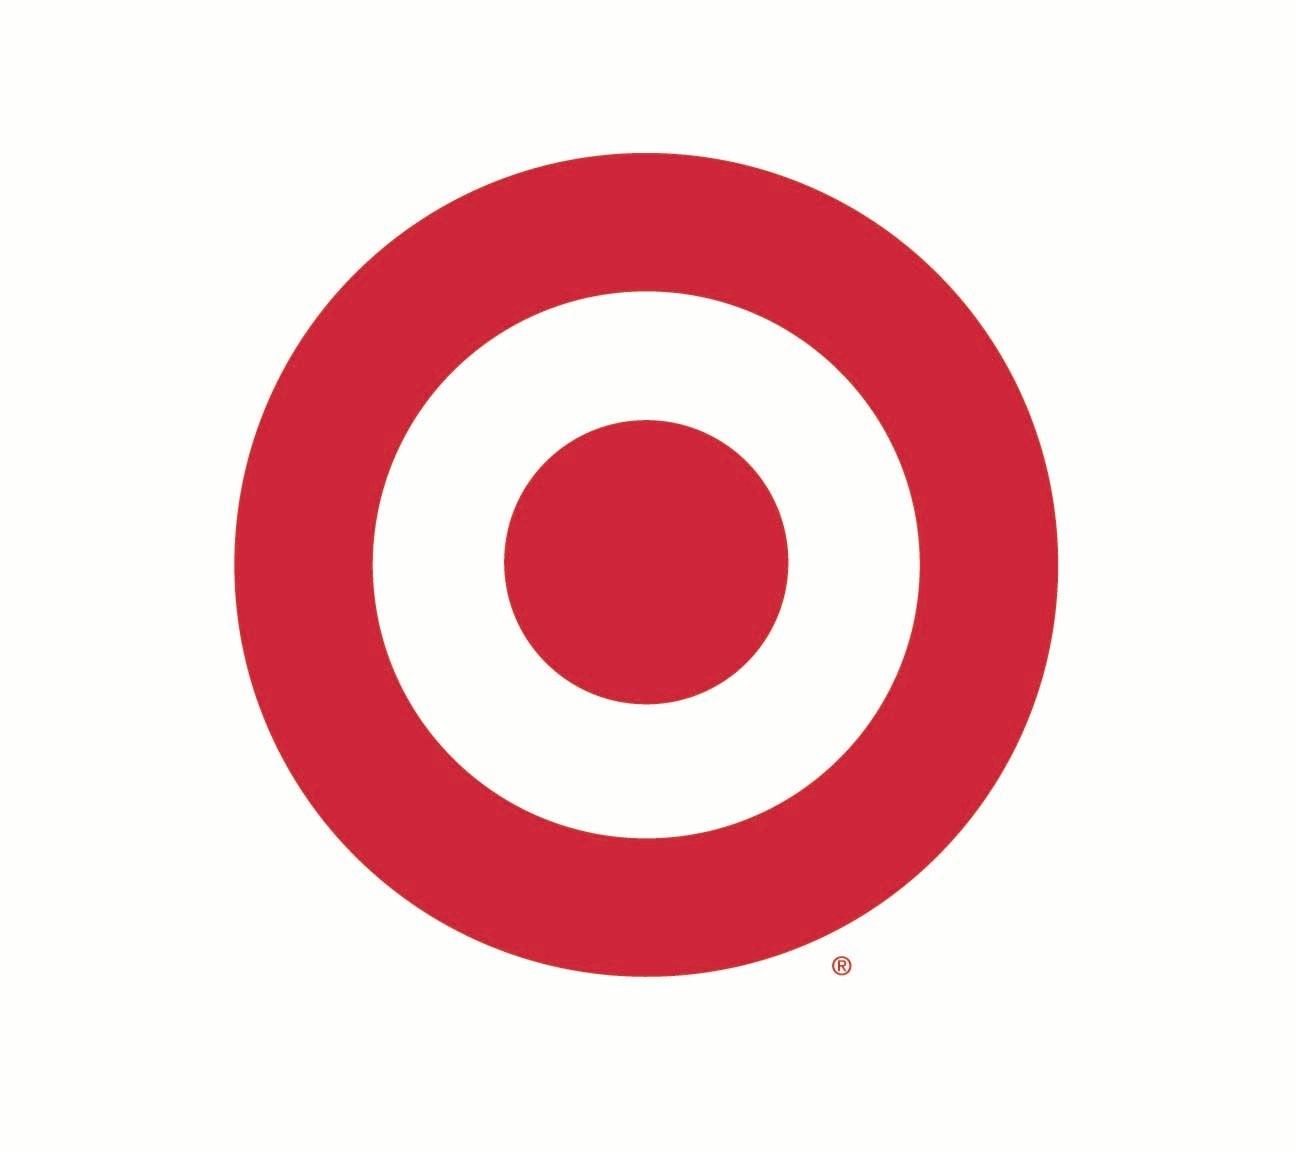 clip art target bullseye - photo #20